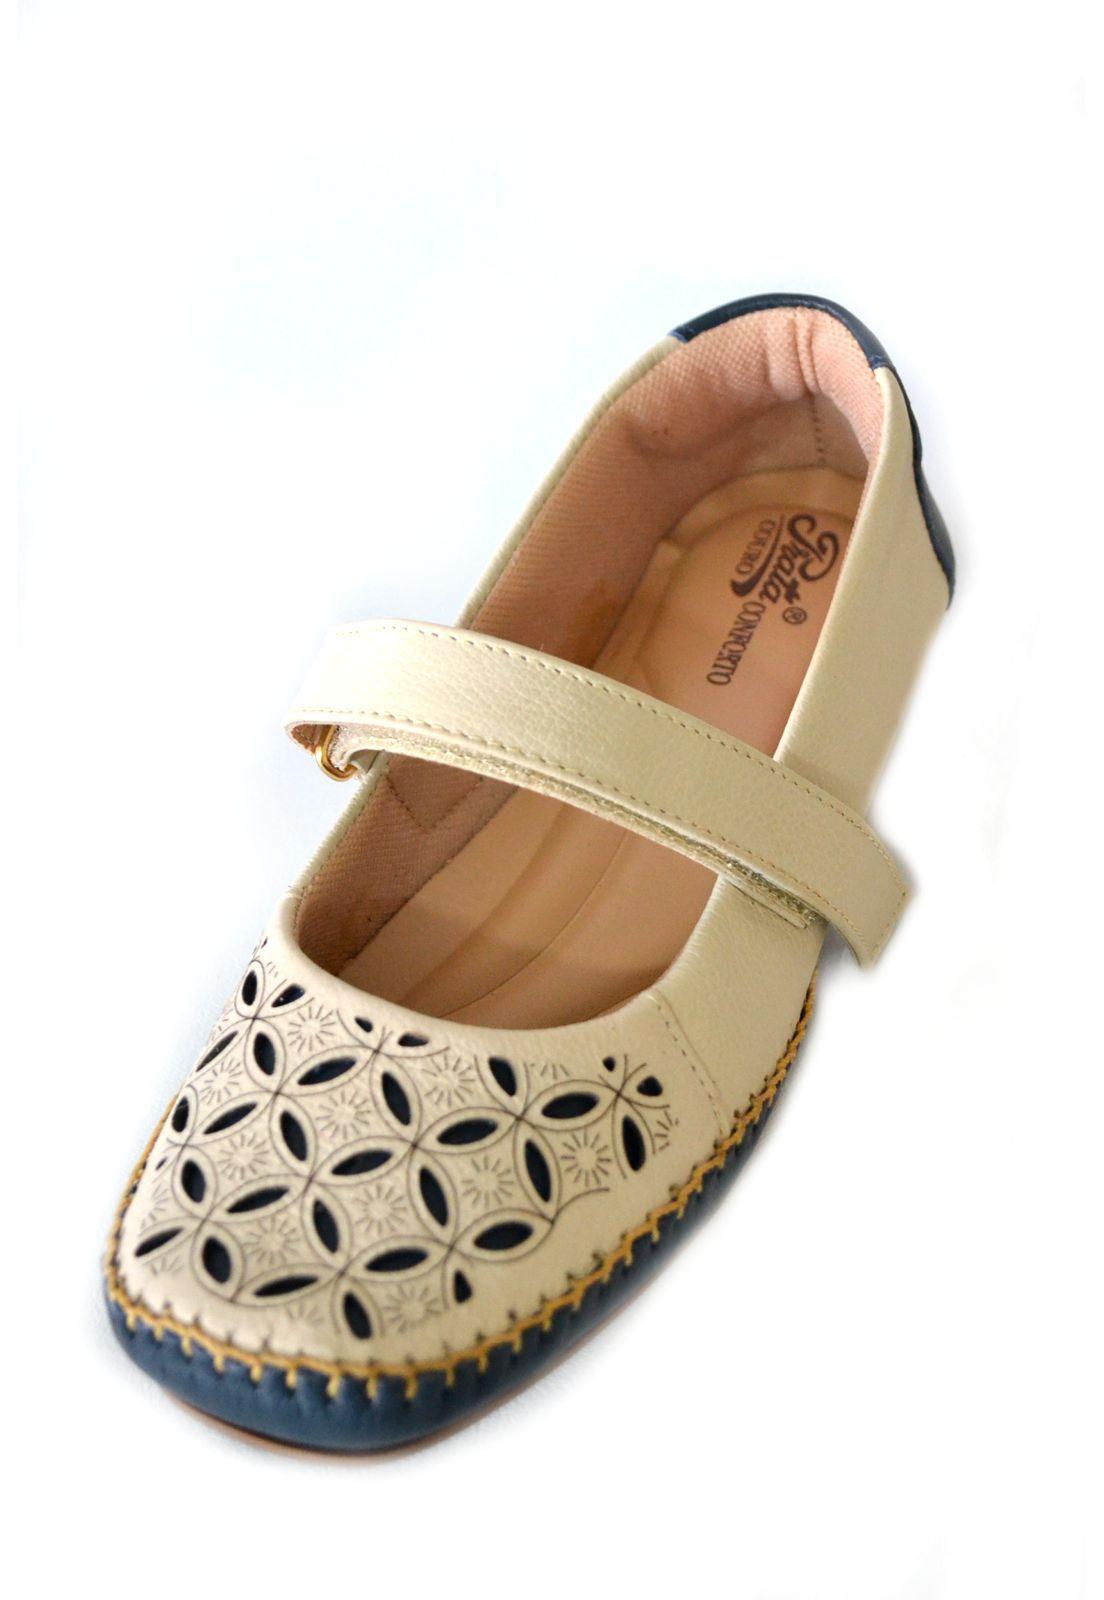 Sapato Feminino  Prata Couro Conforto 1010040 Marfim/marinho